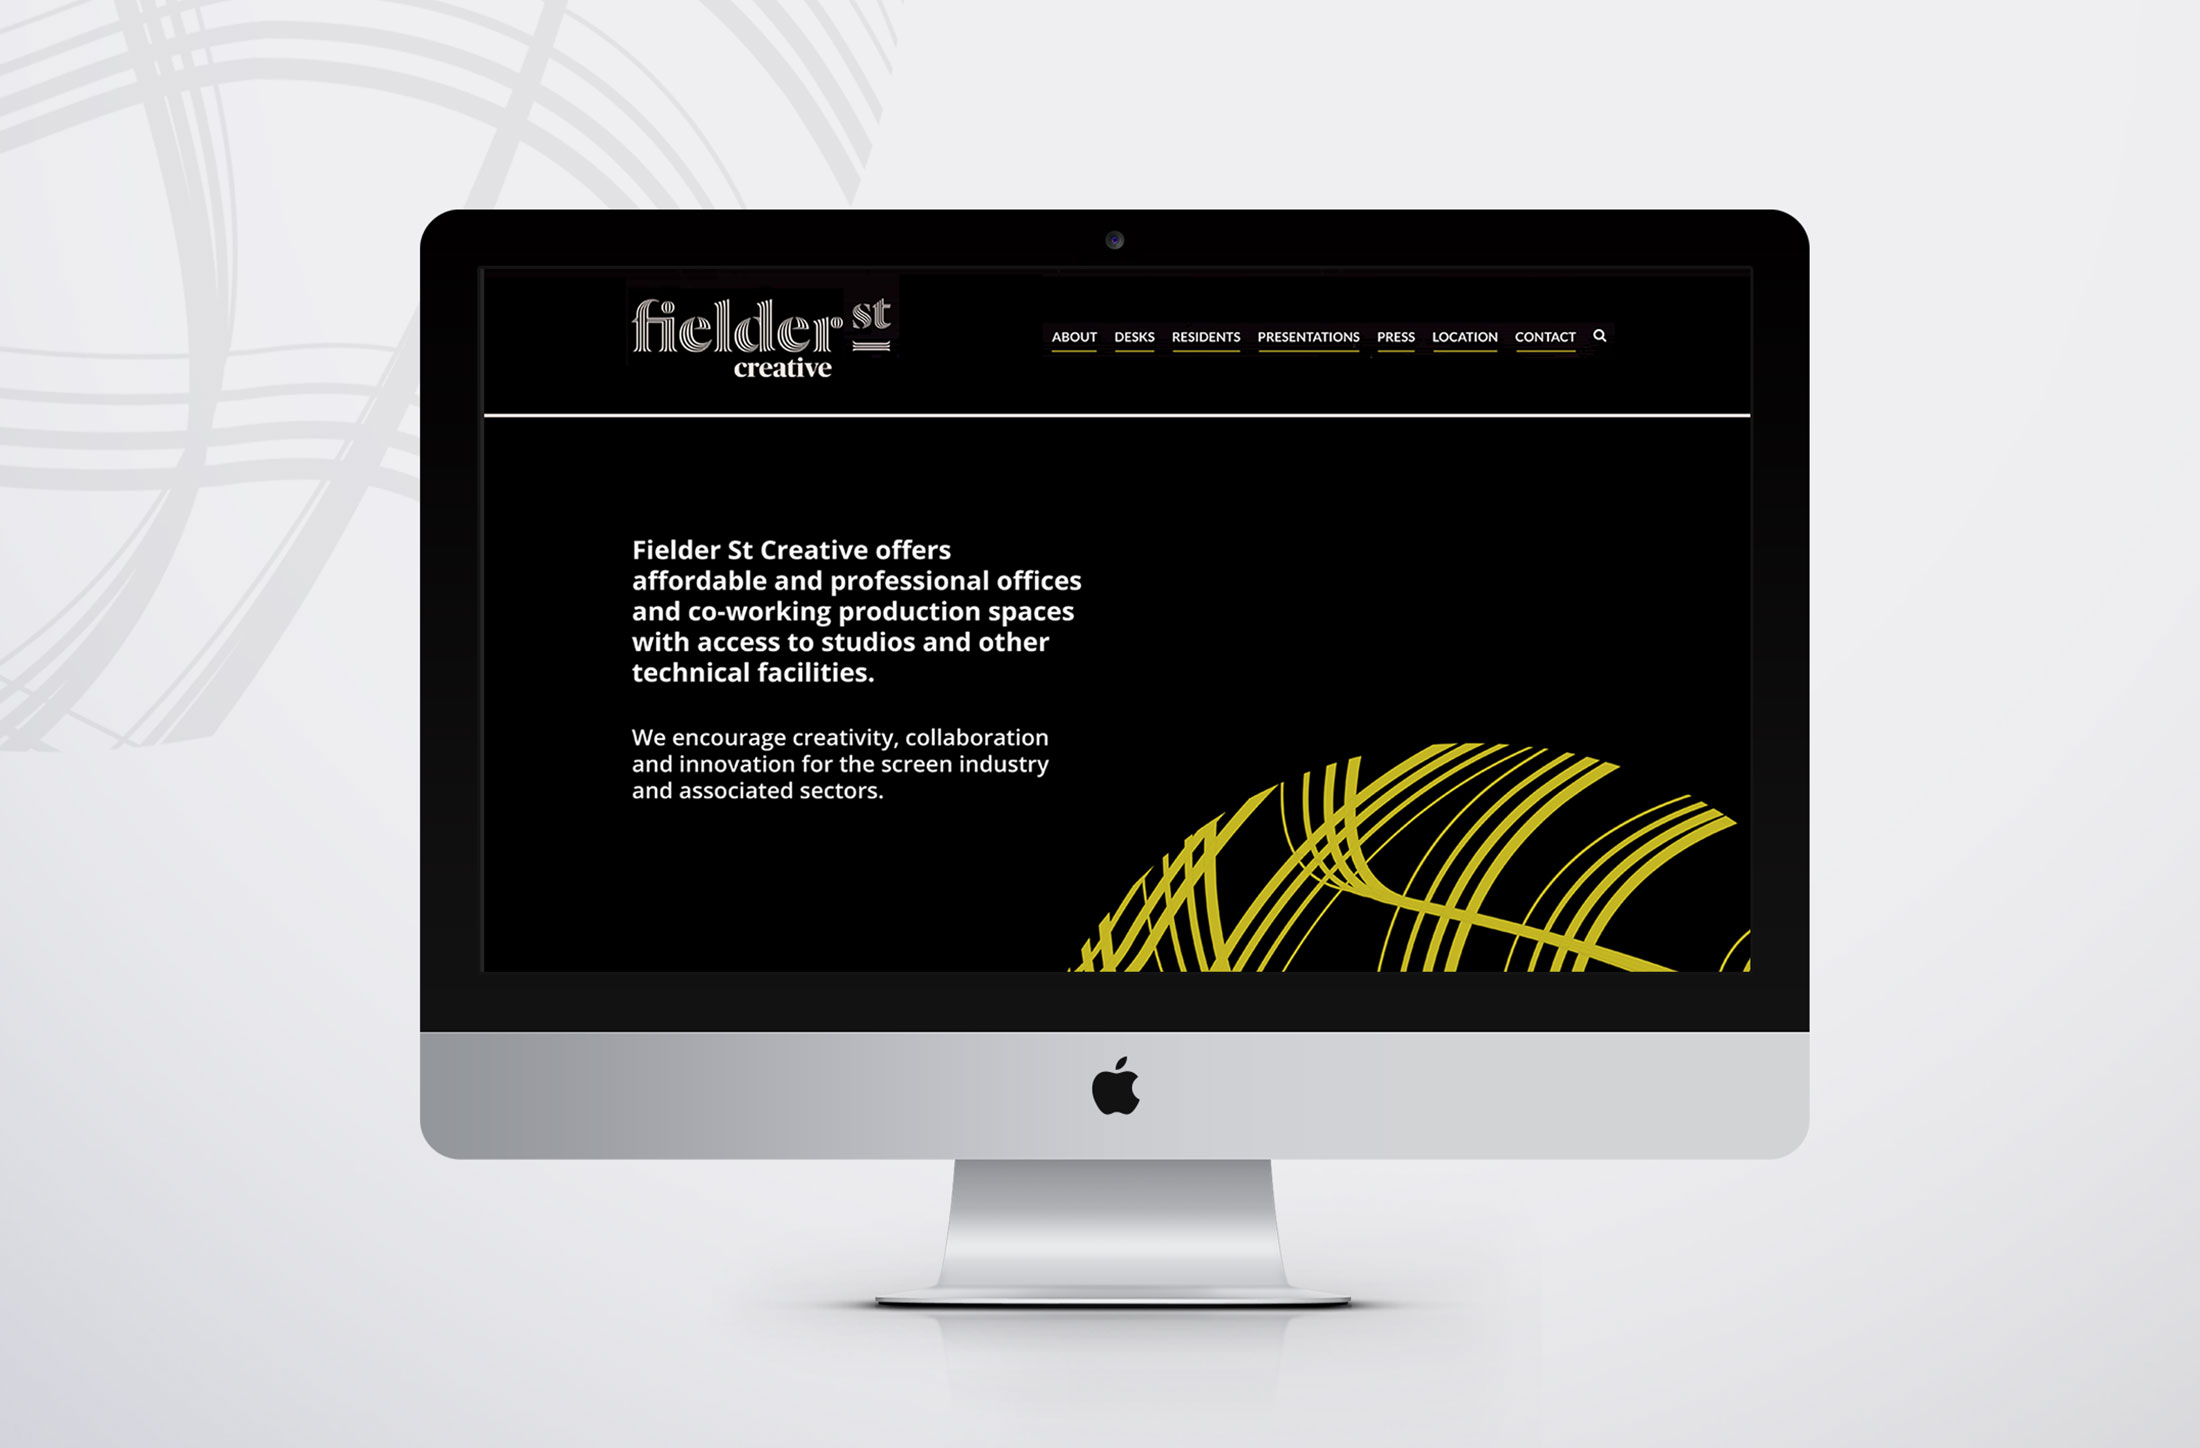 Fielder Street Creative – Website